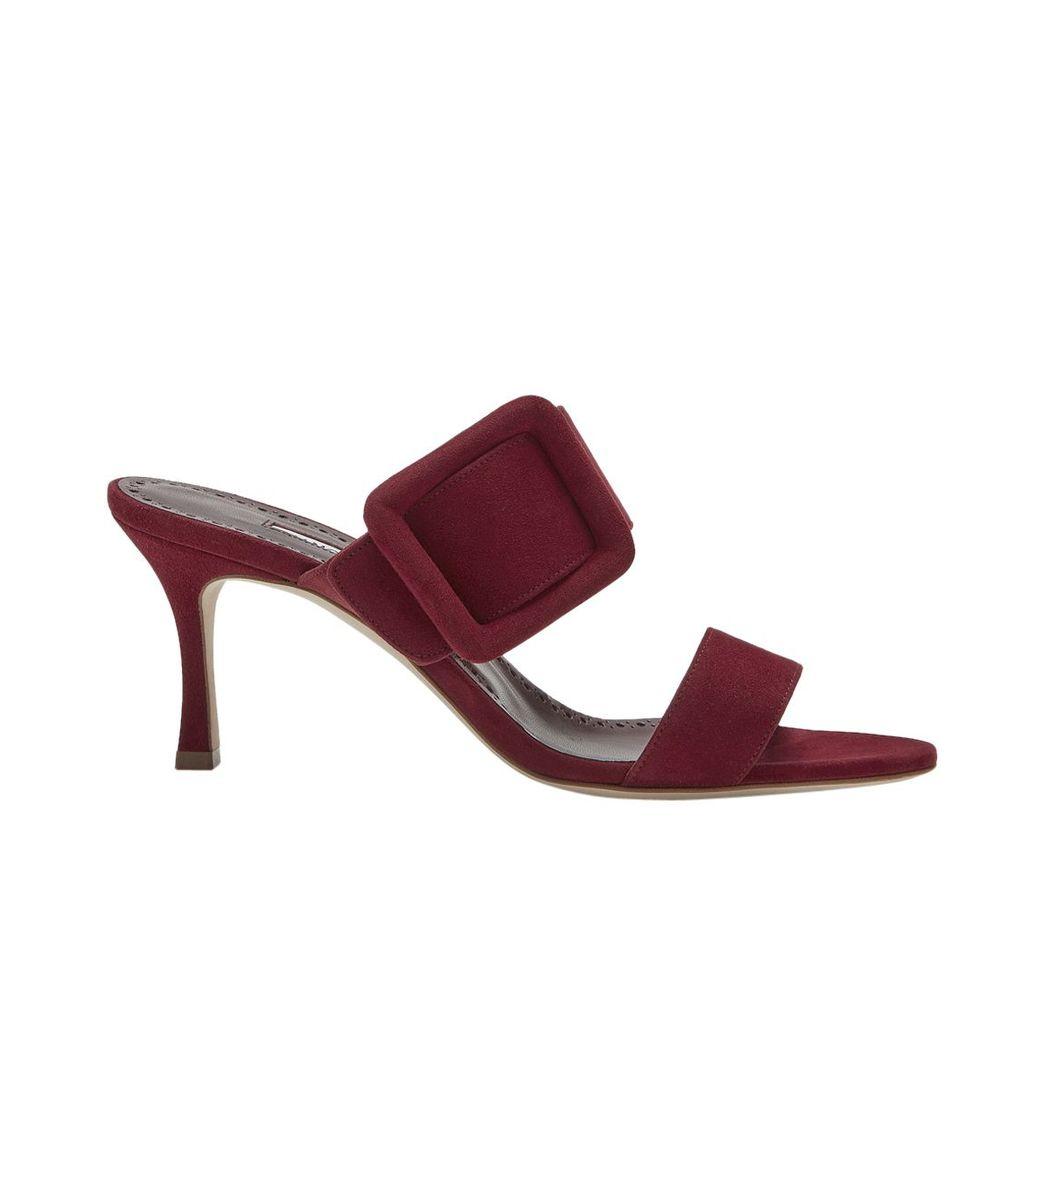 Manolo Blahnik Dark Red Gable Sandals